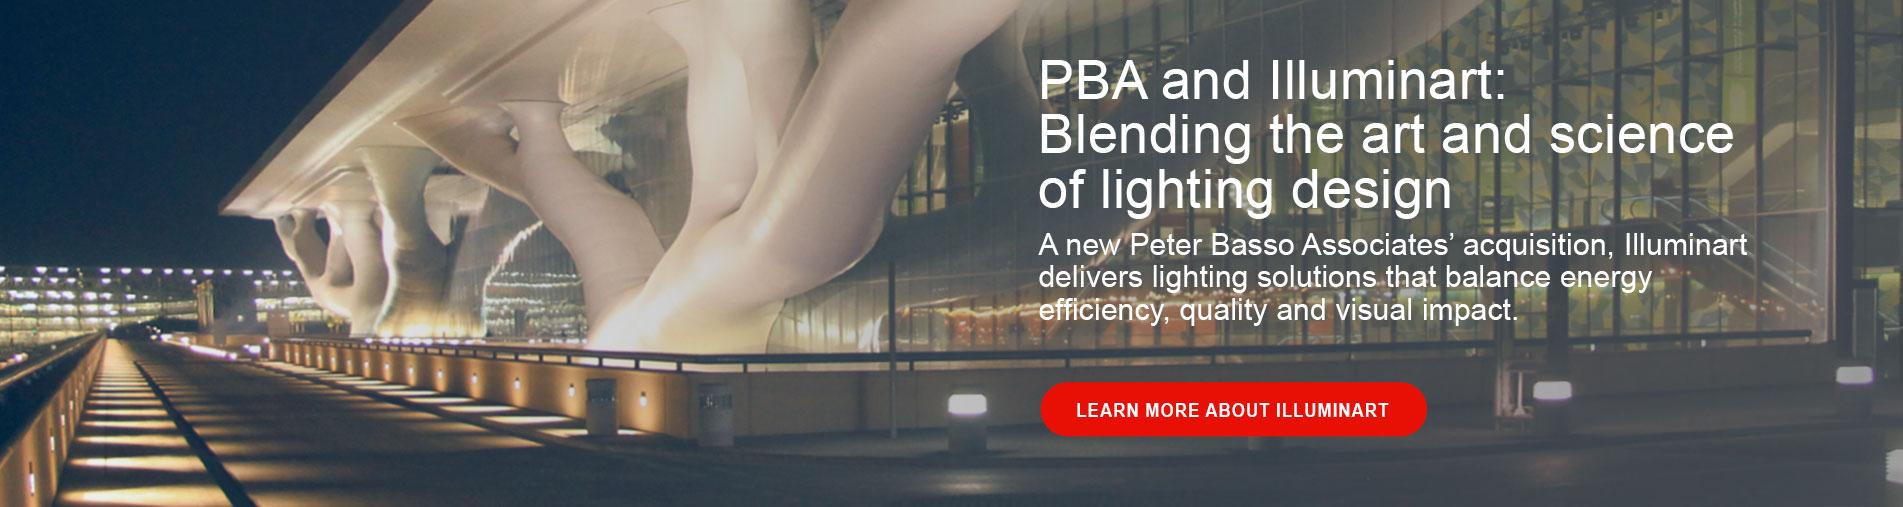 PBA-Illuminart_Banner.jpg